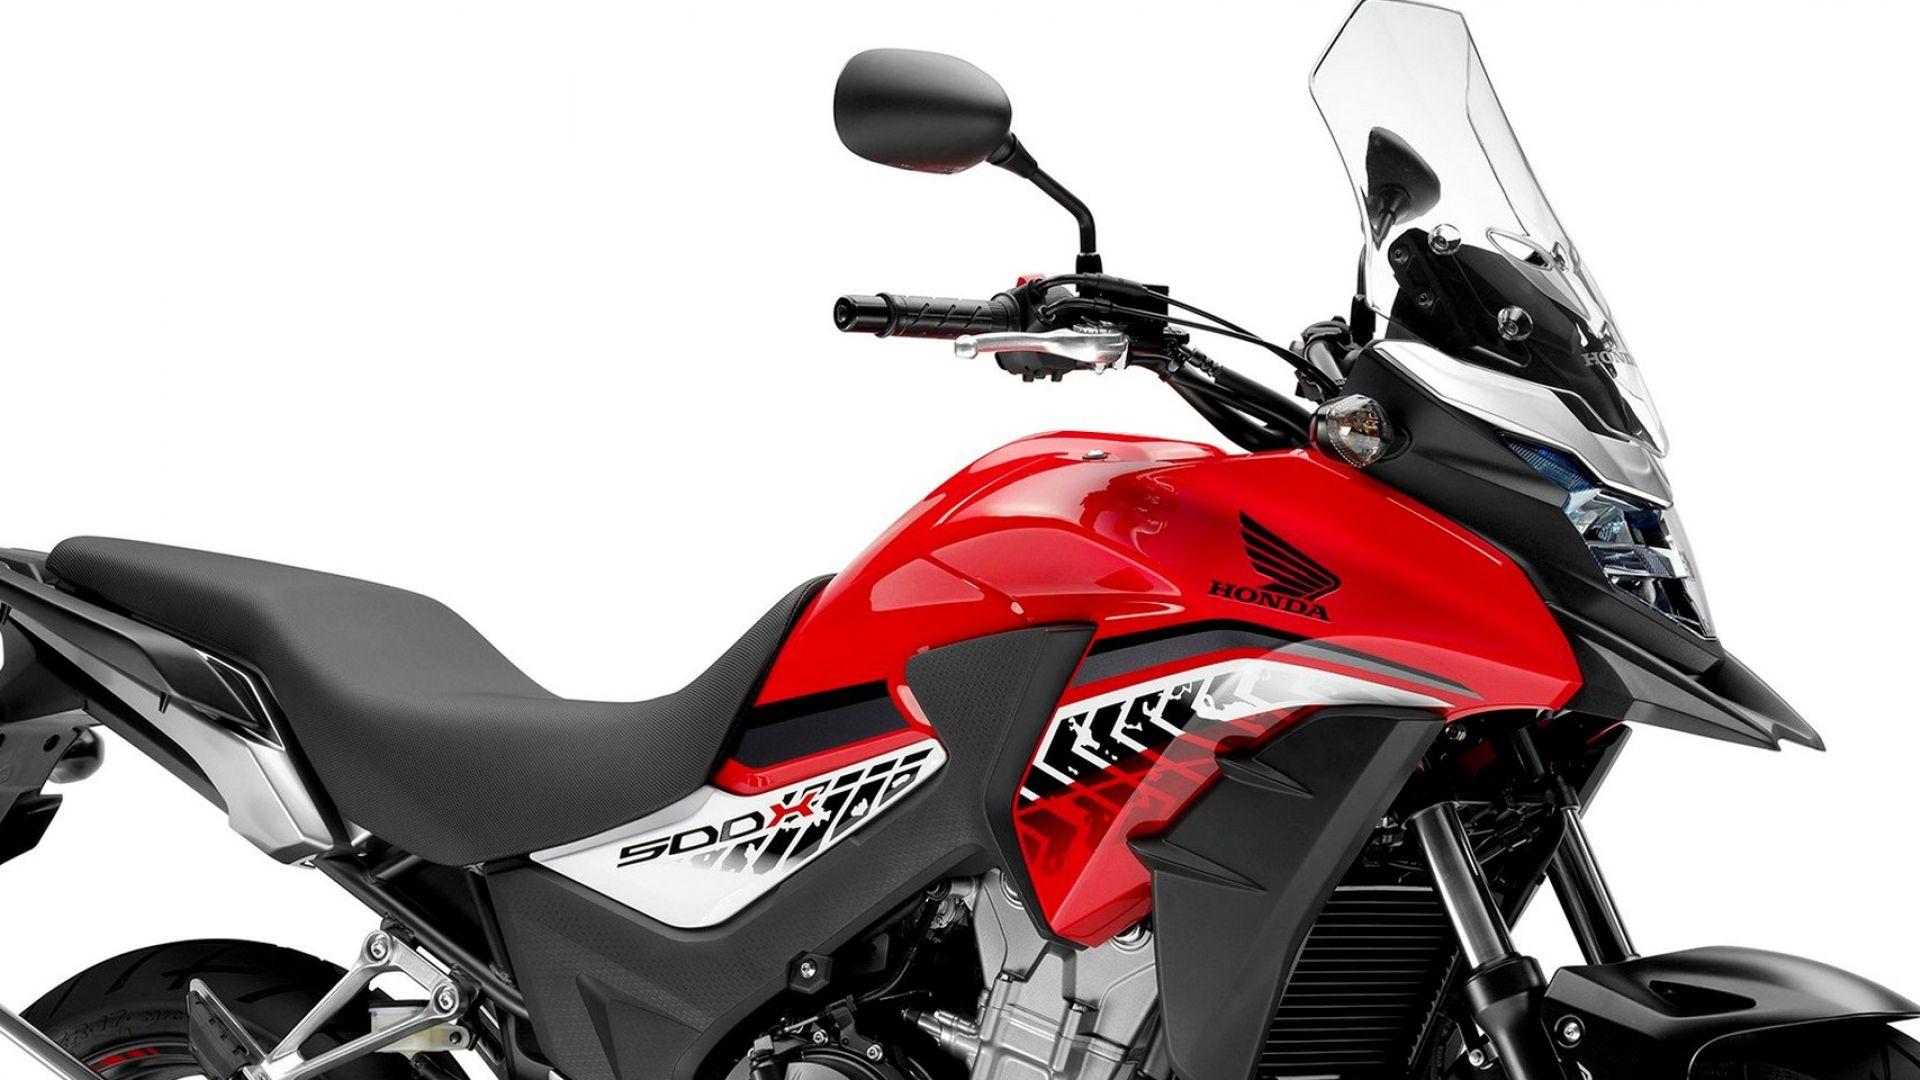 novit moto honda cb500x 2016 motorbox. Black Bedroom Furniture Sets. Home Design Ideas